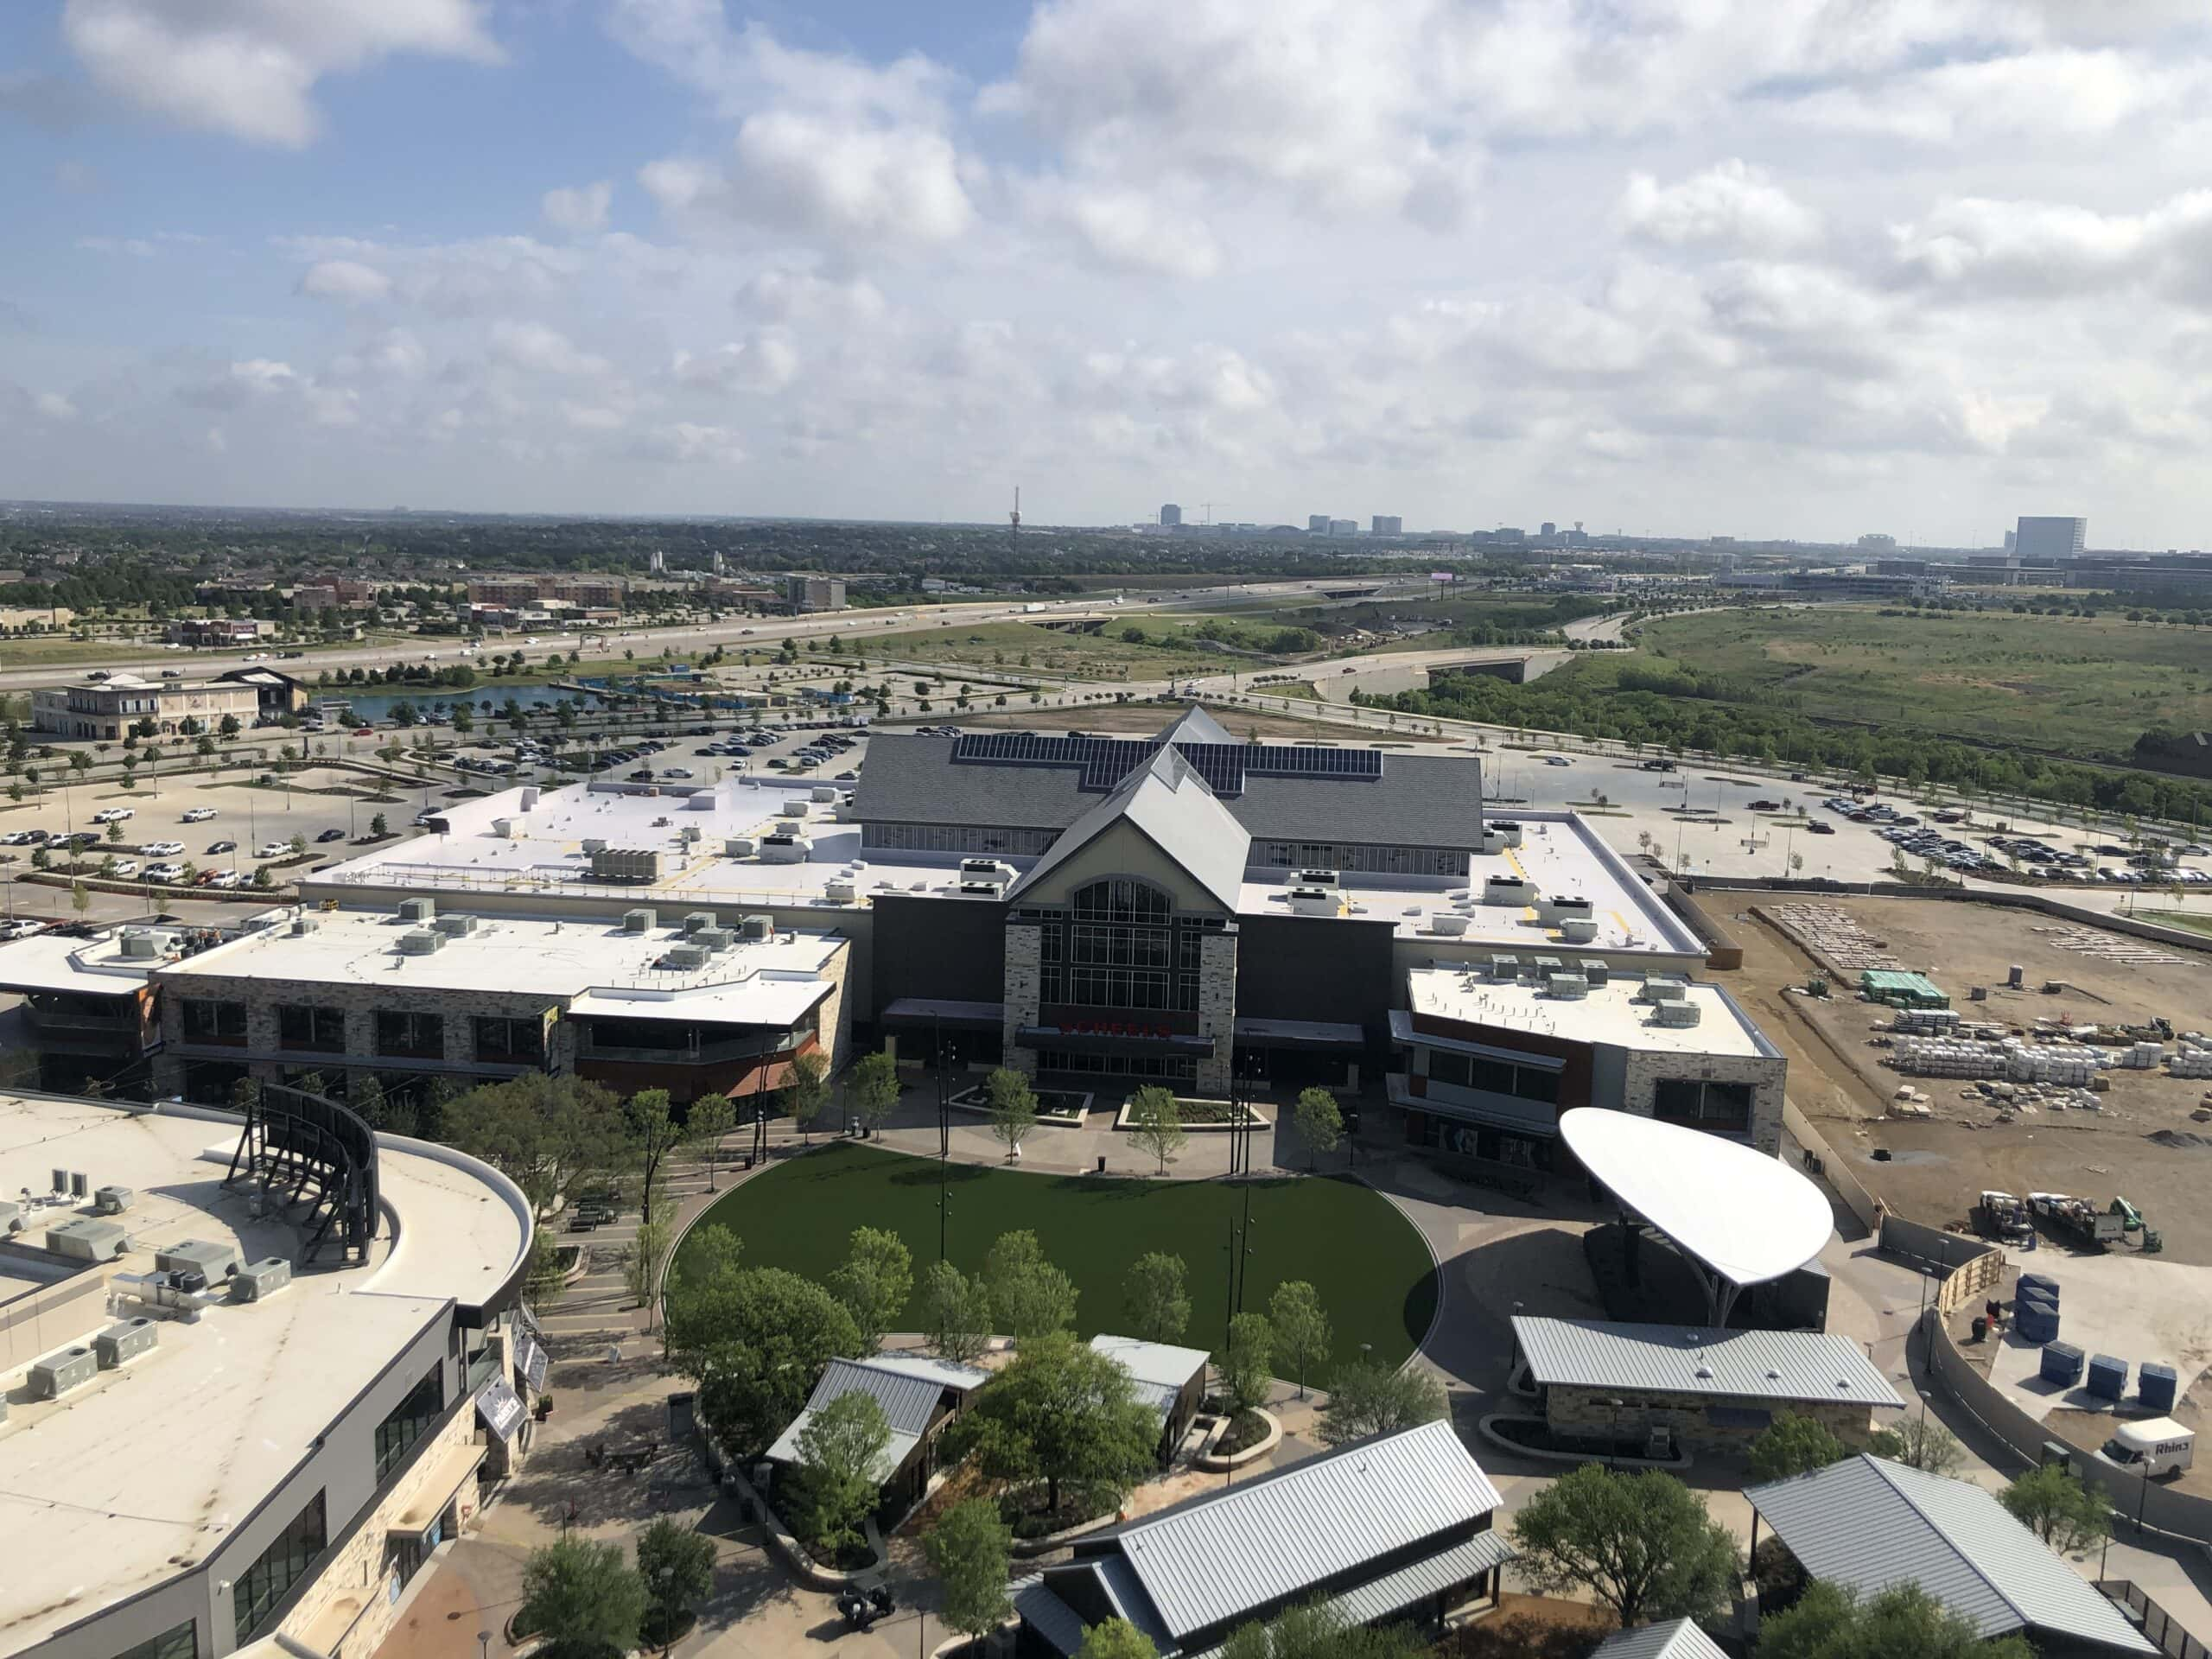 Aerial view pf lawn